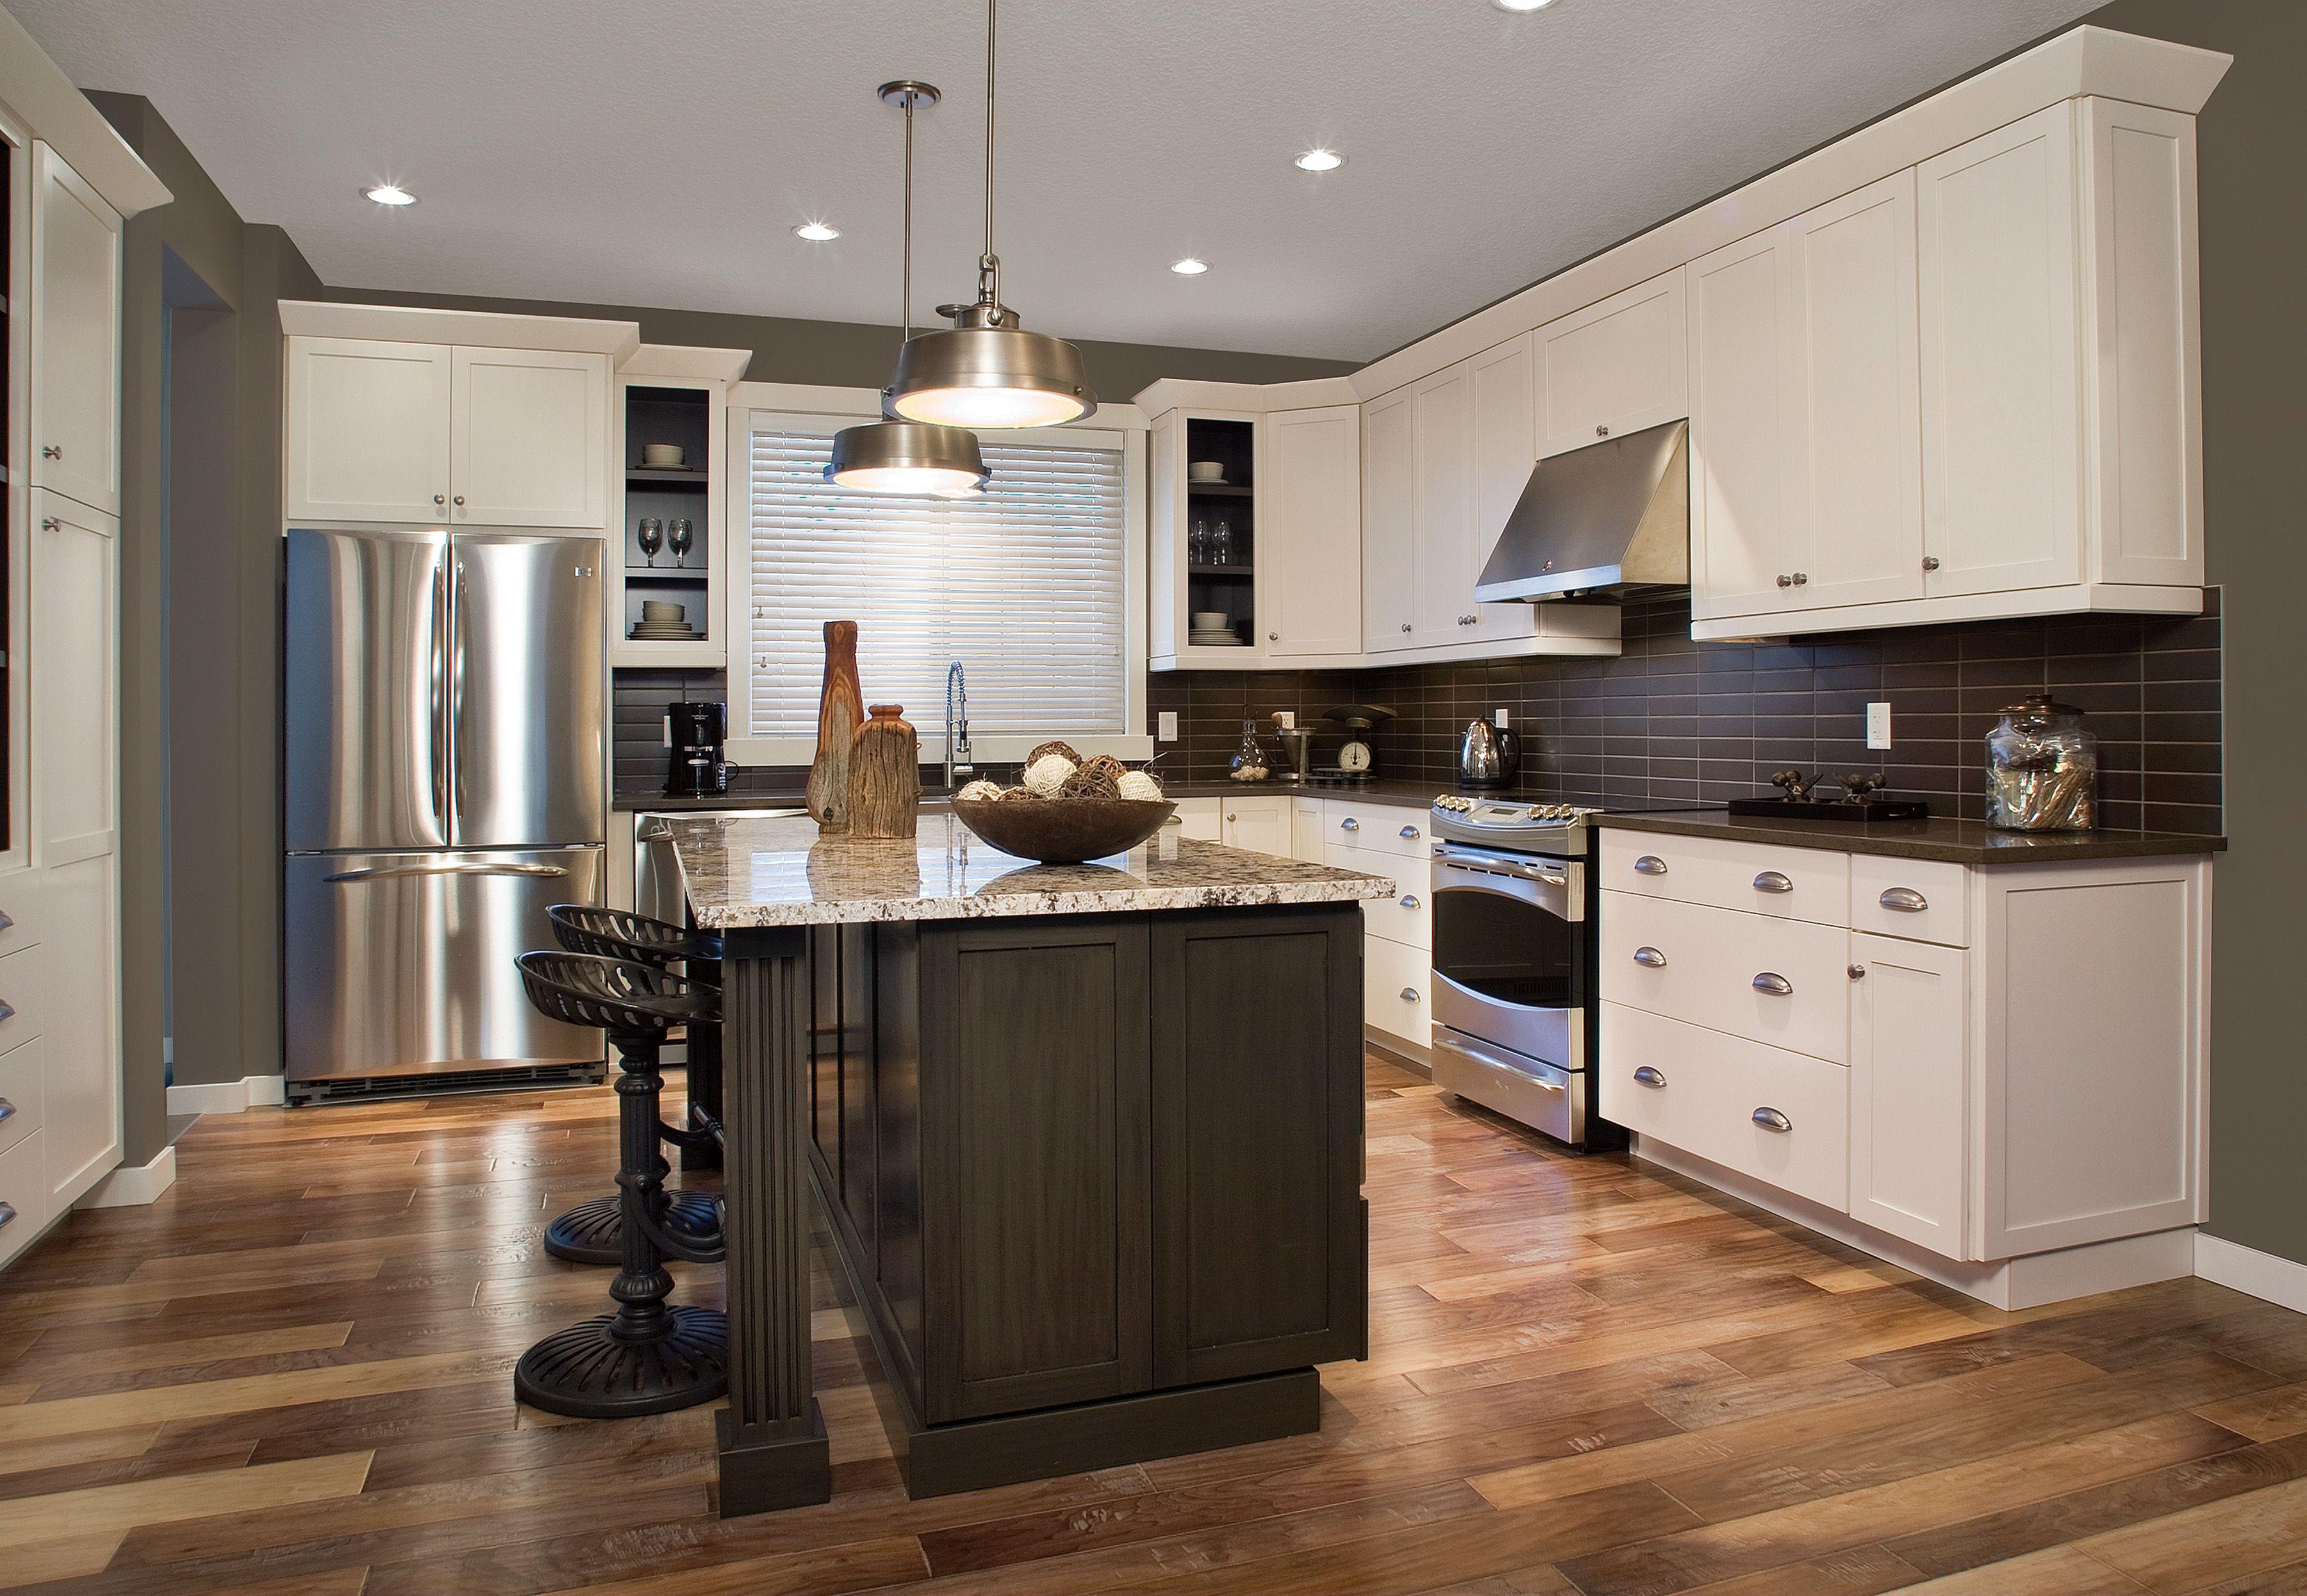 two huntwood kitchens for homesavi in edmonton, alberta